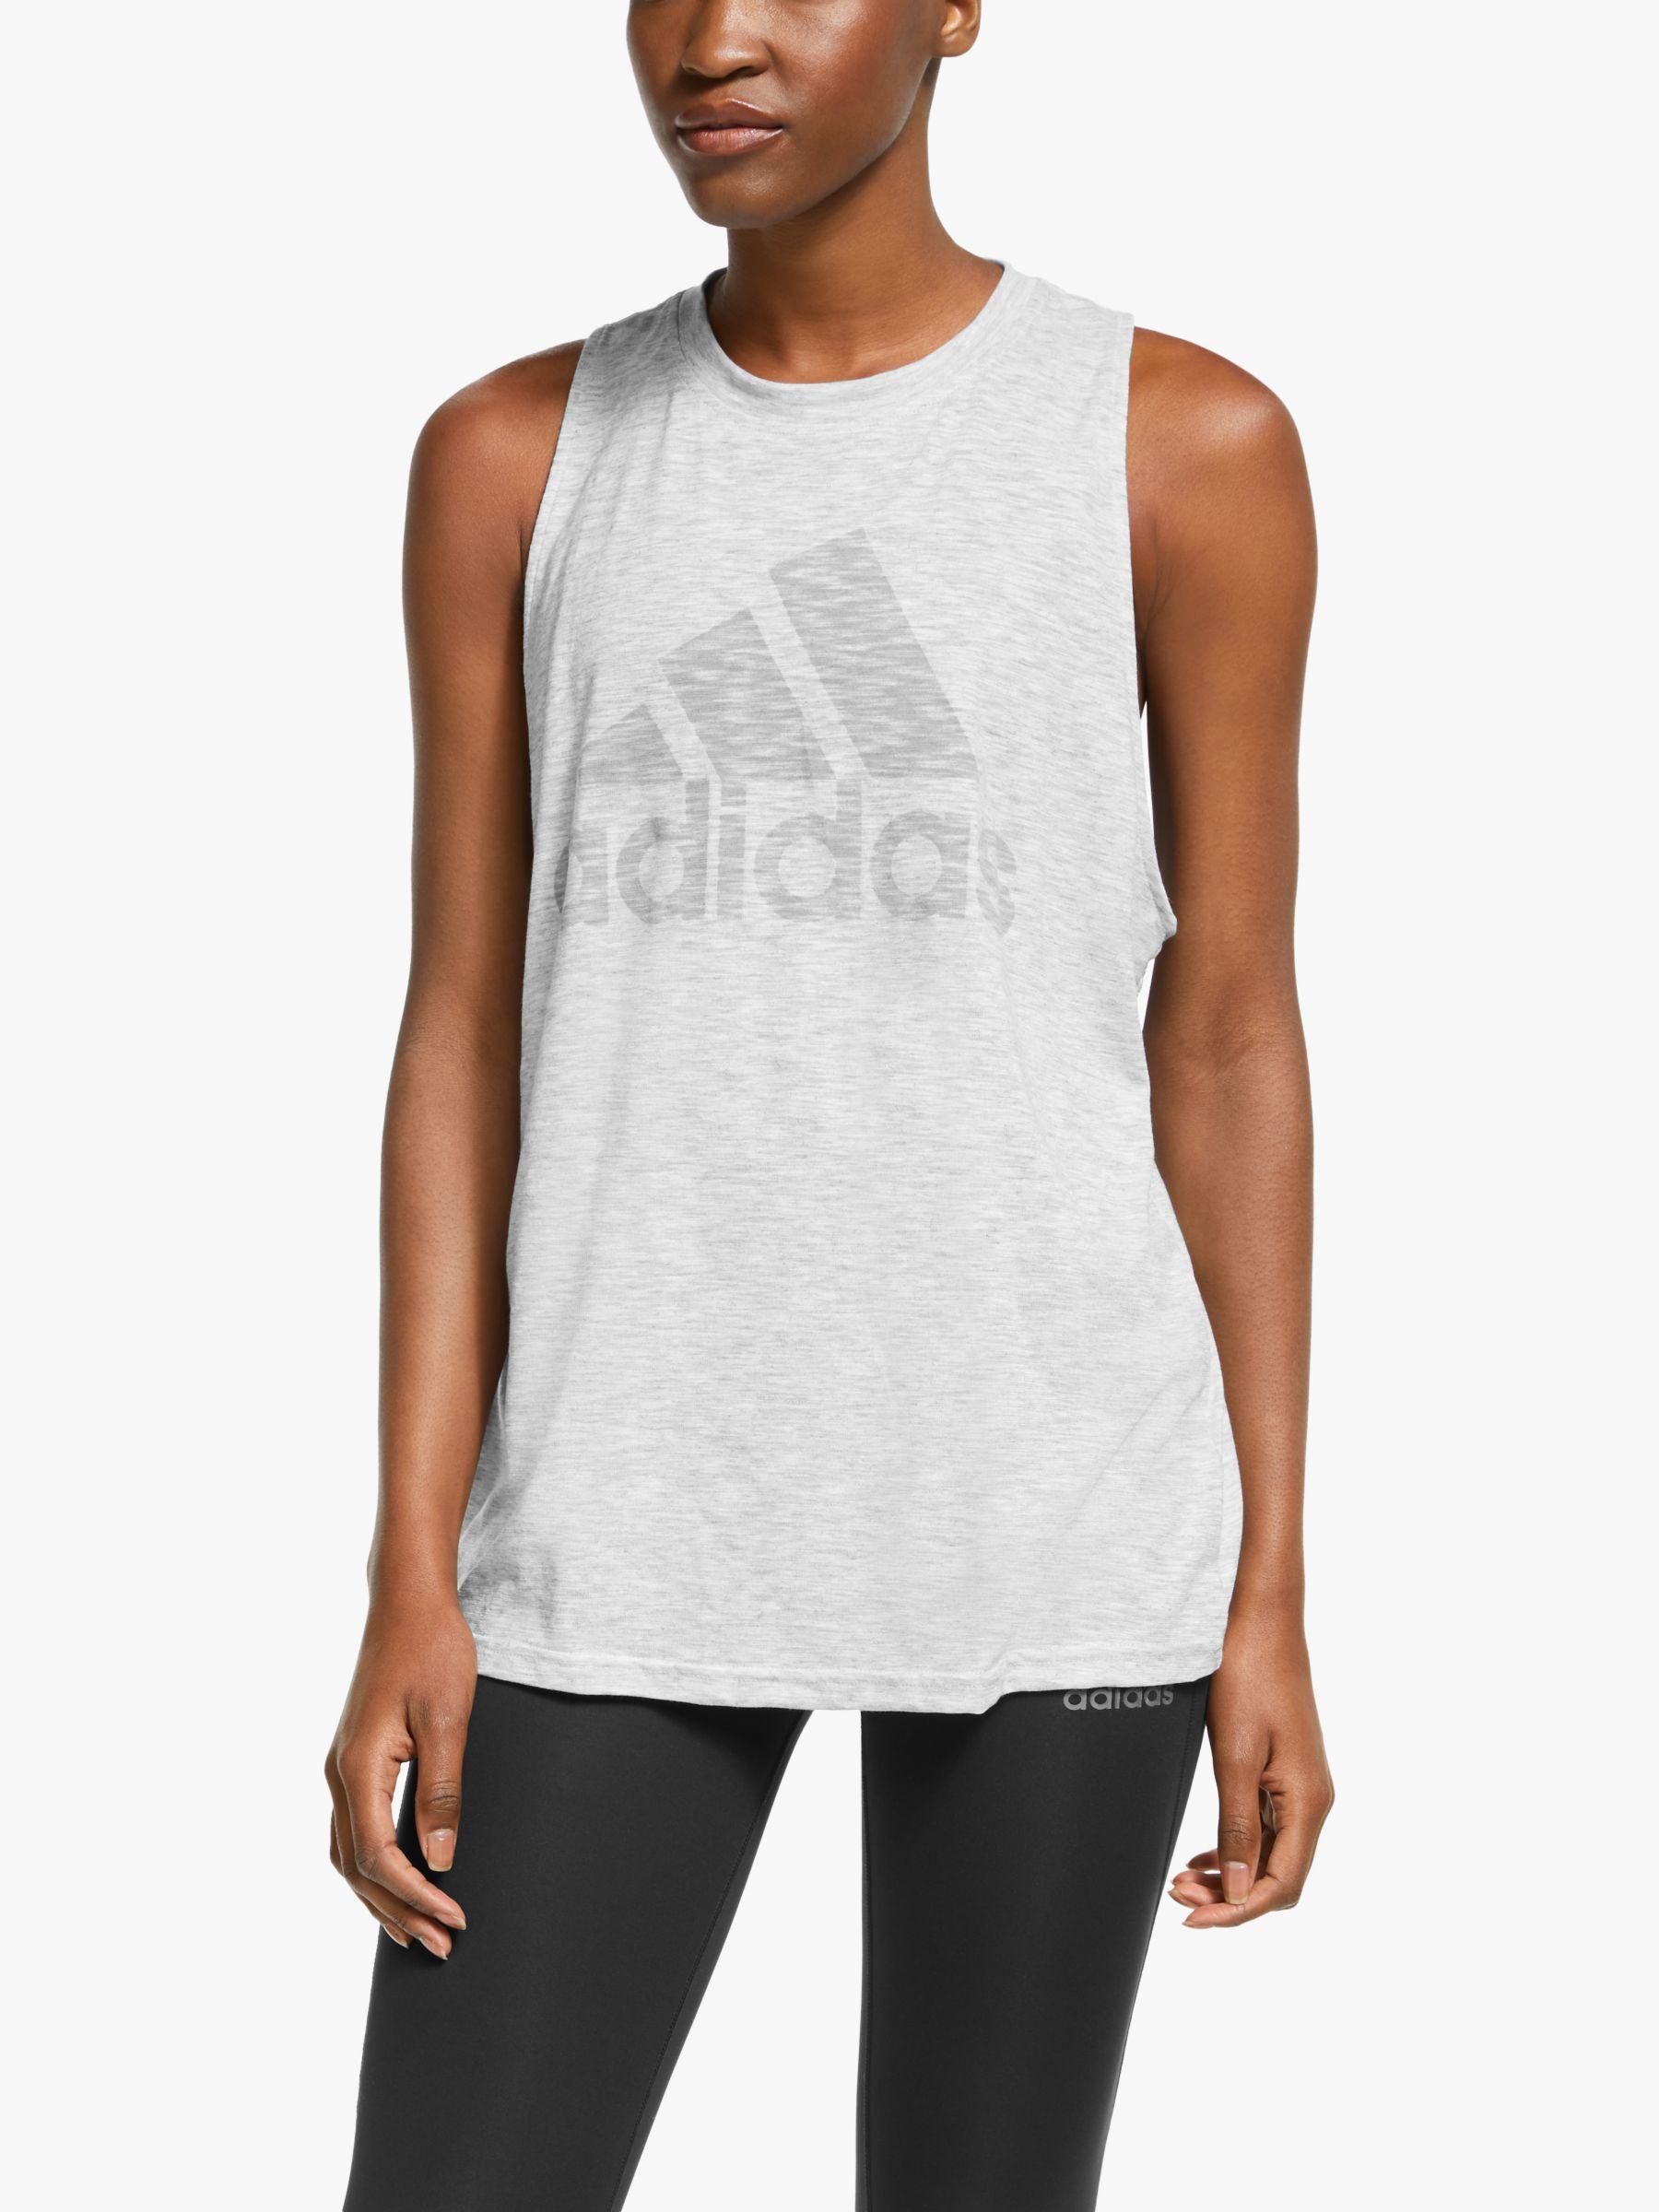 Adidas adidas Winners Tank Top, White Melange